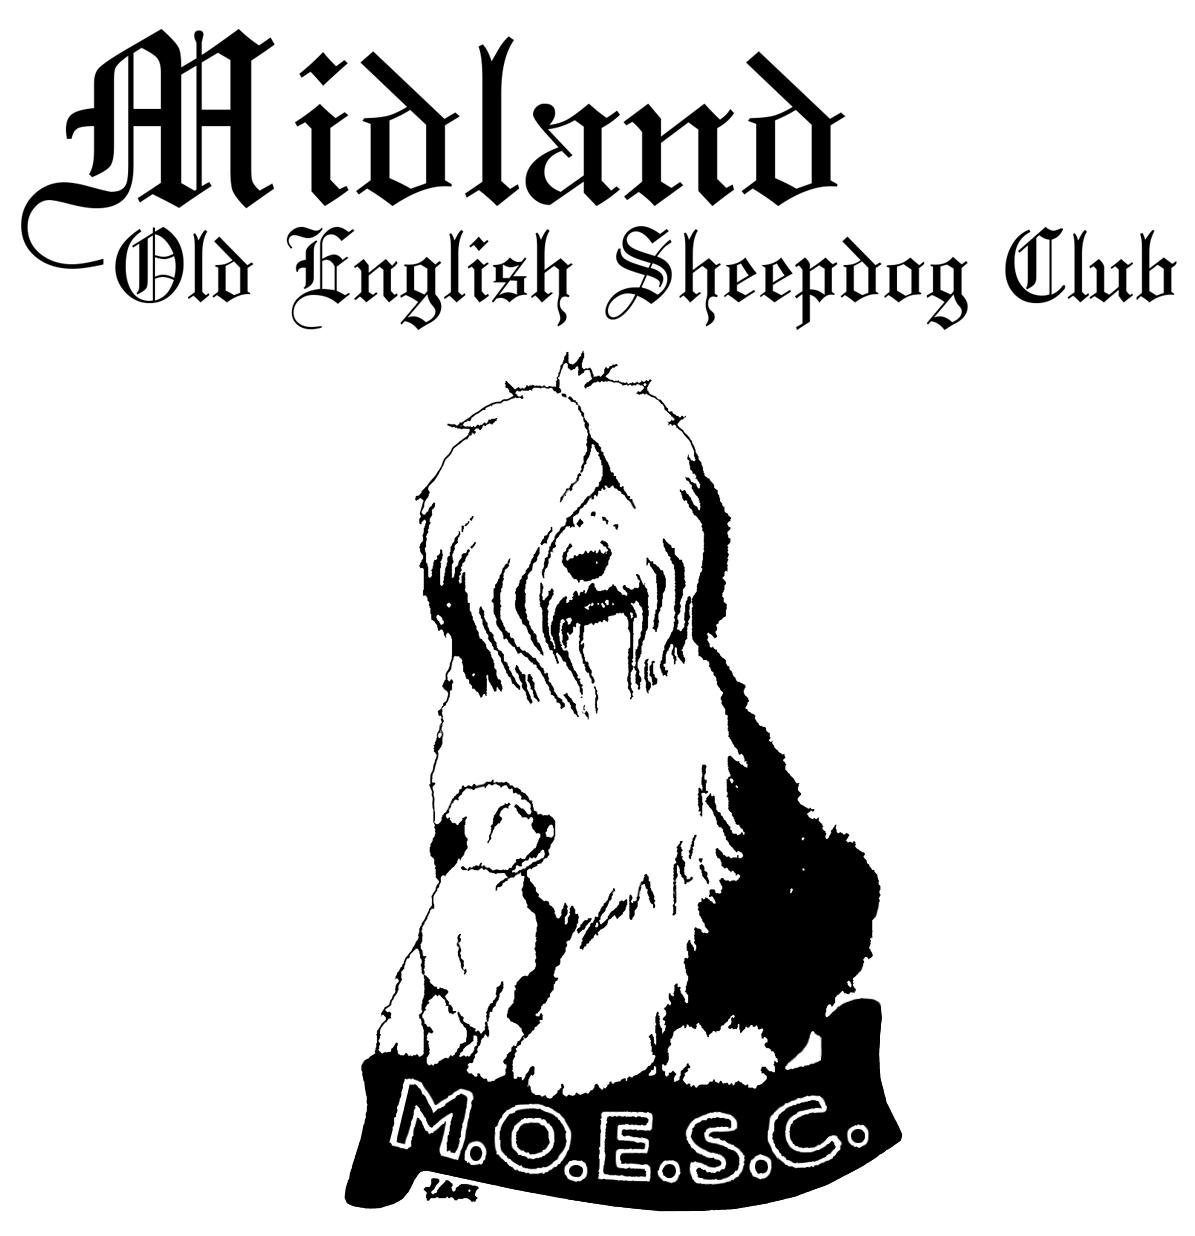 Midland Old English Sheepdog Club - September Ch Show